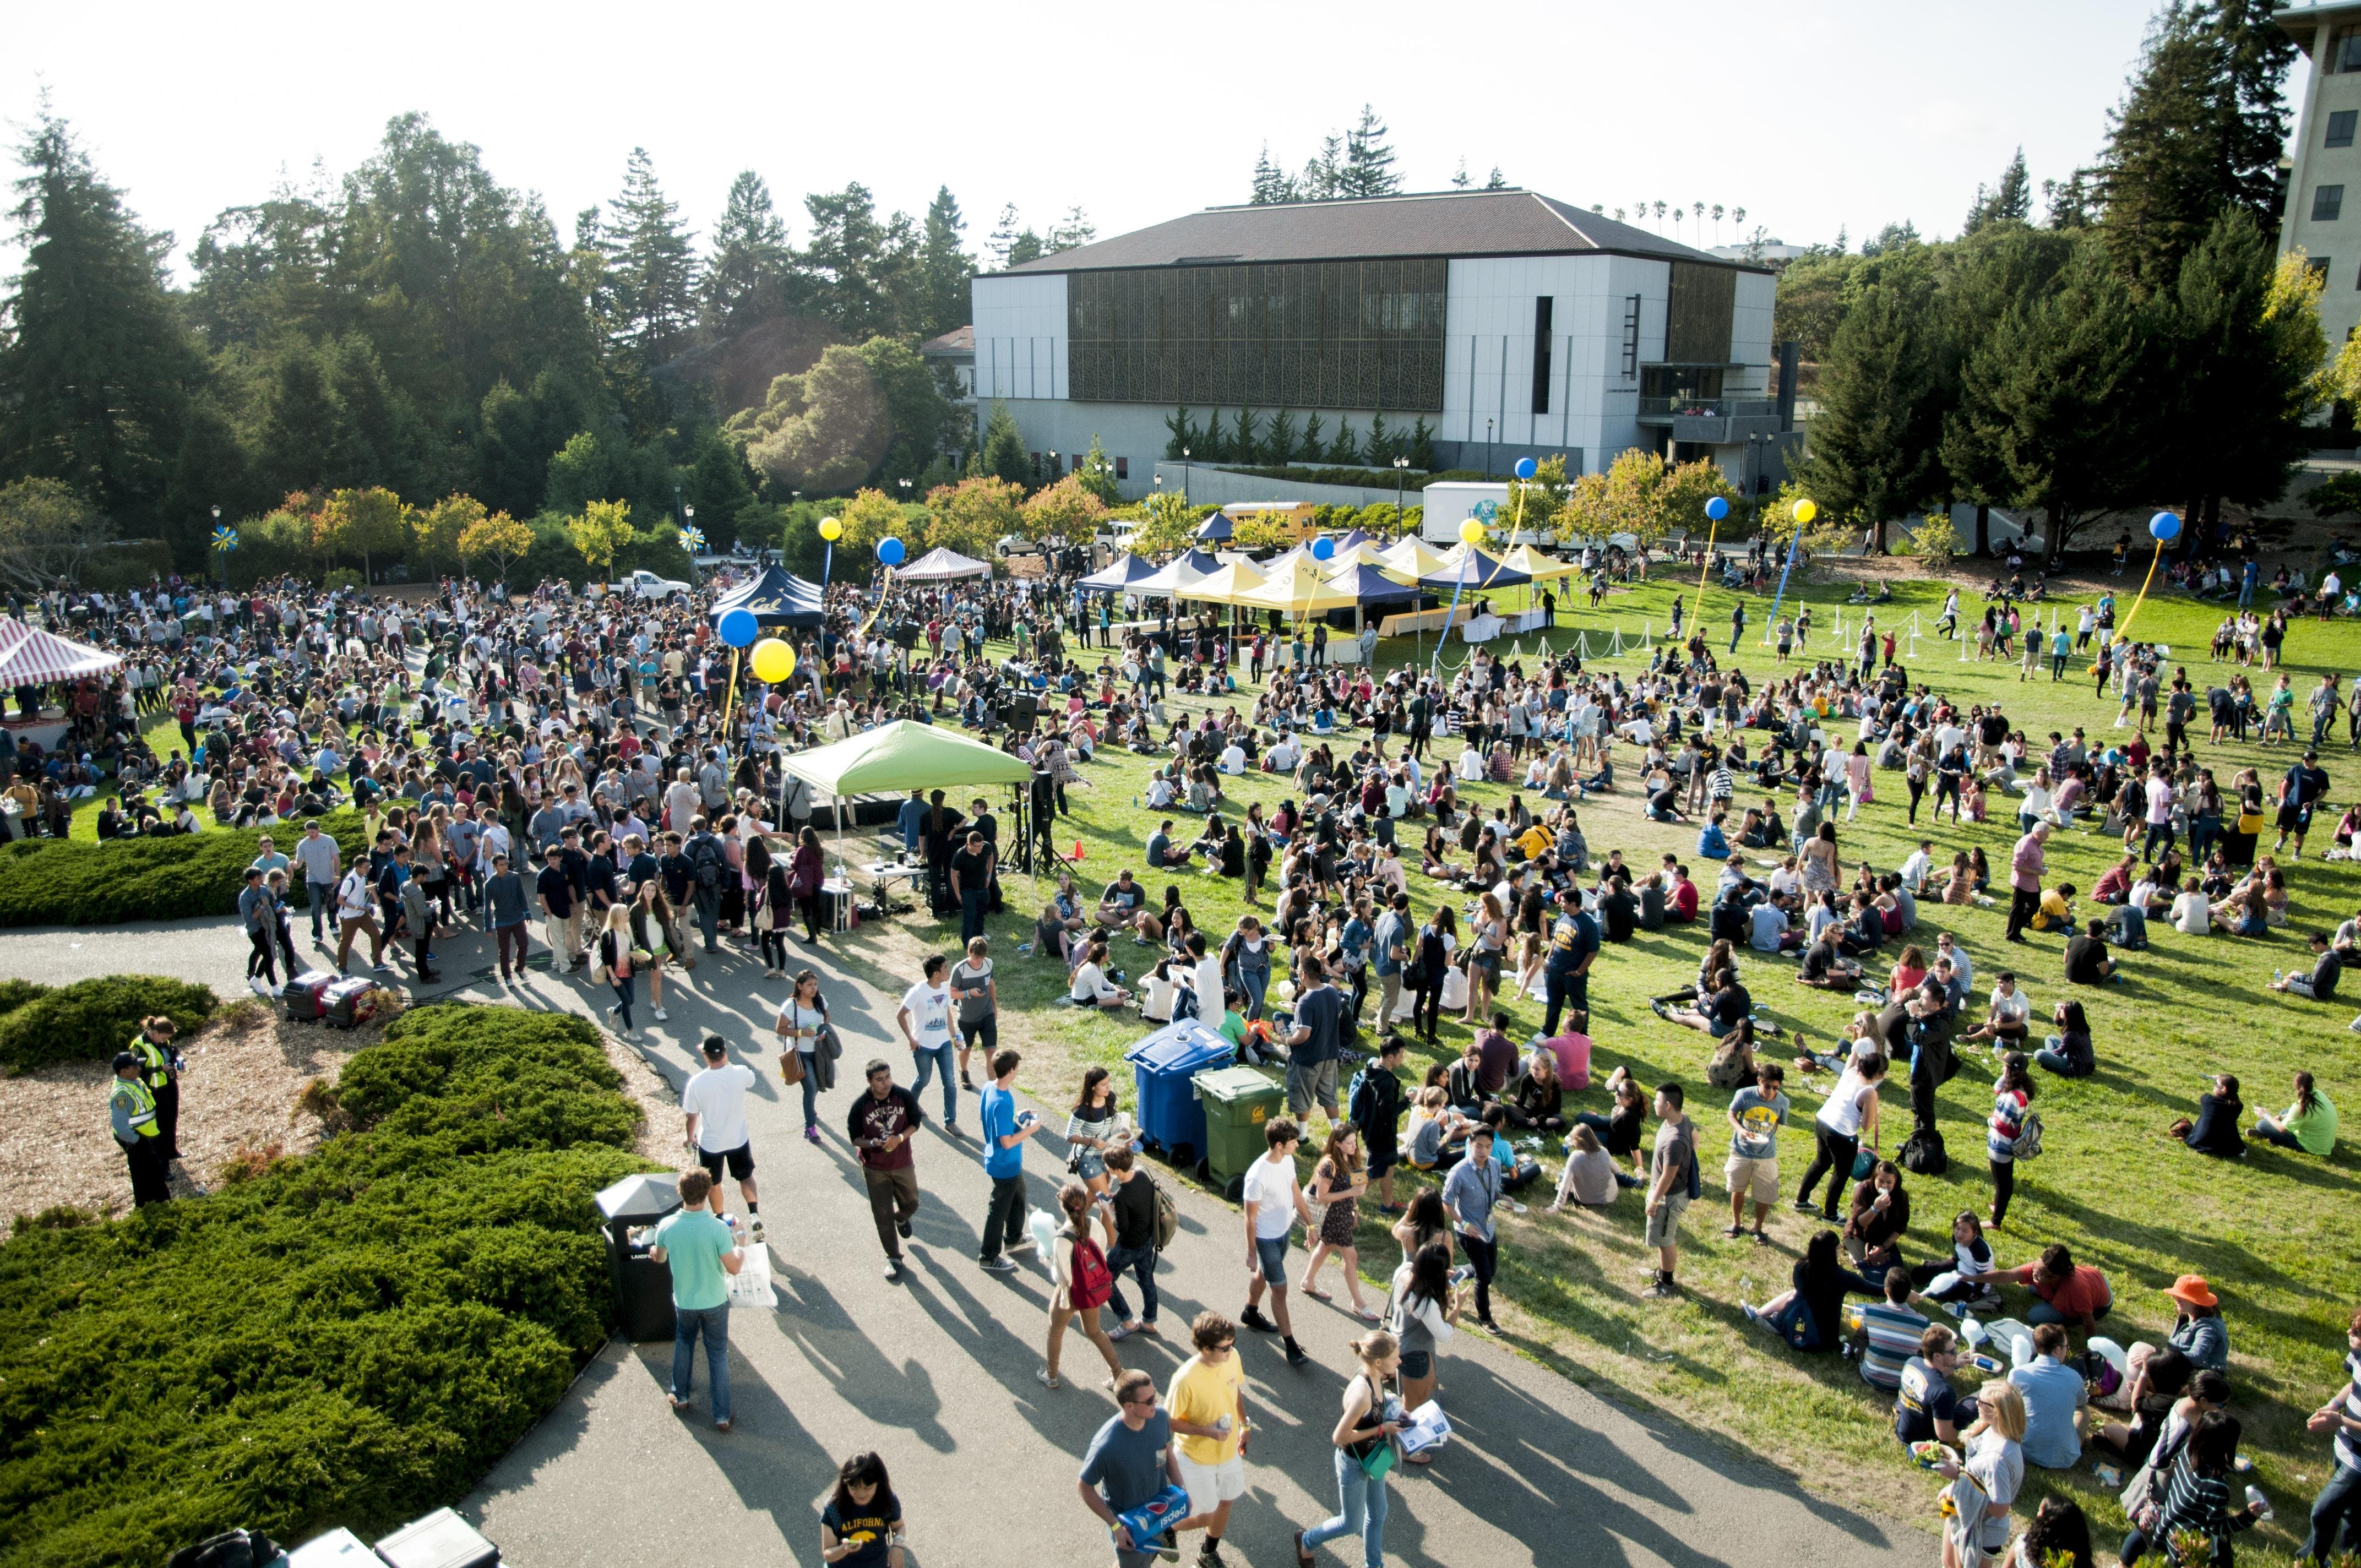 2018 Golden Bear Orientation Alumni-Student Mixer